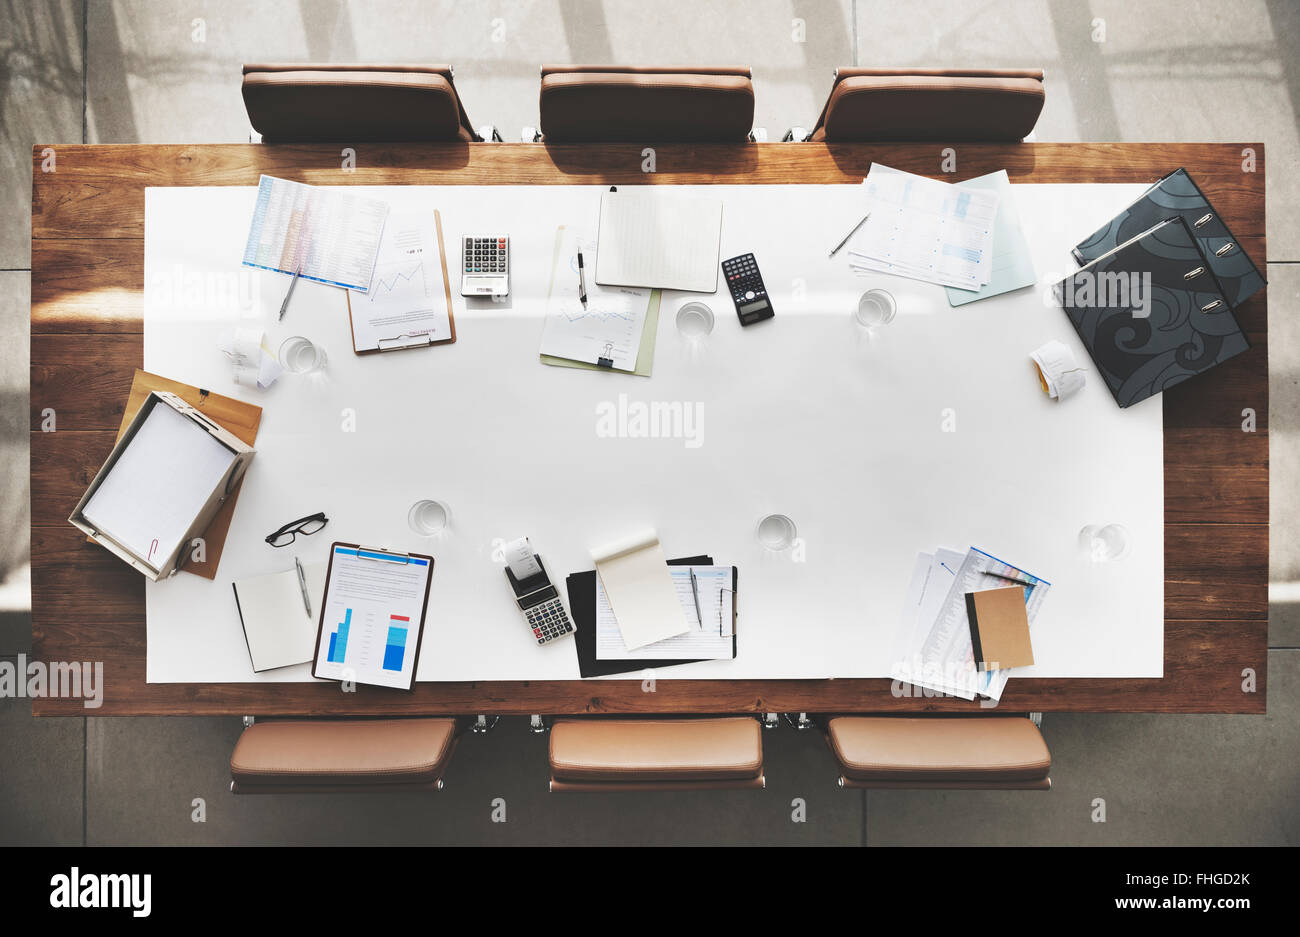 Meeting Room With Target Stock Photos Meeting Room With Target - Target conference table